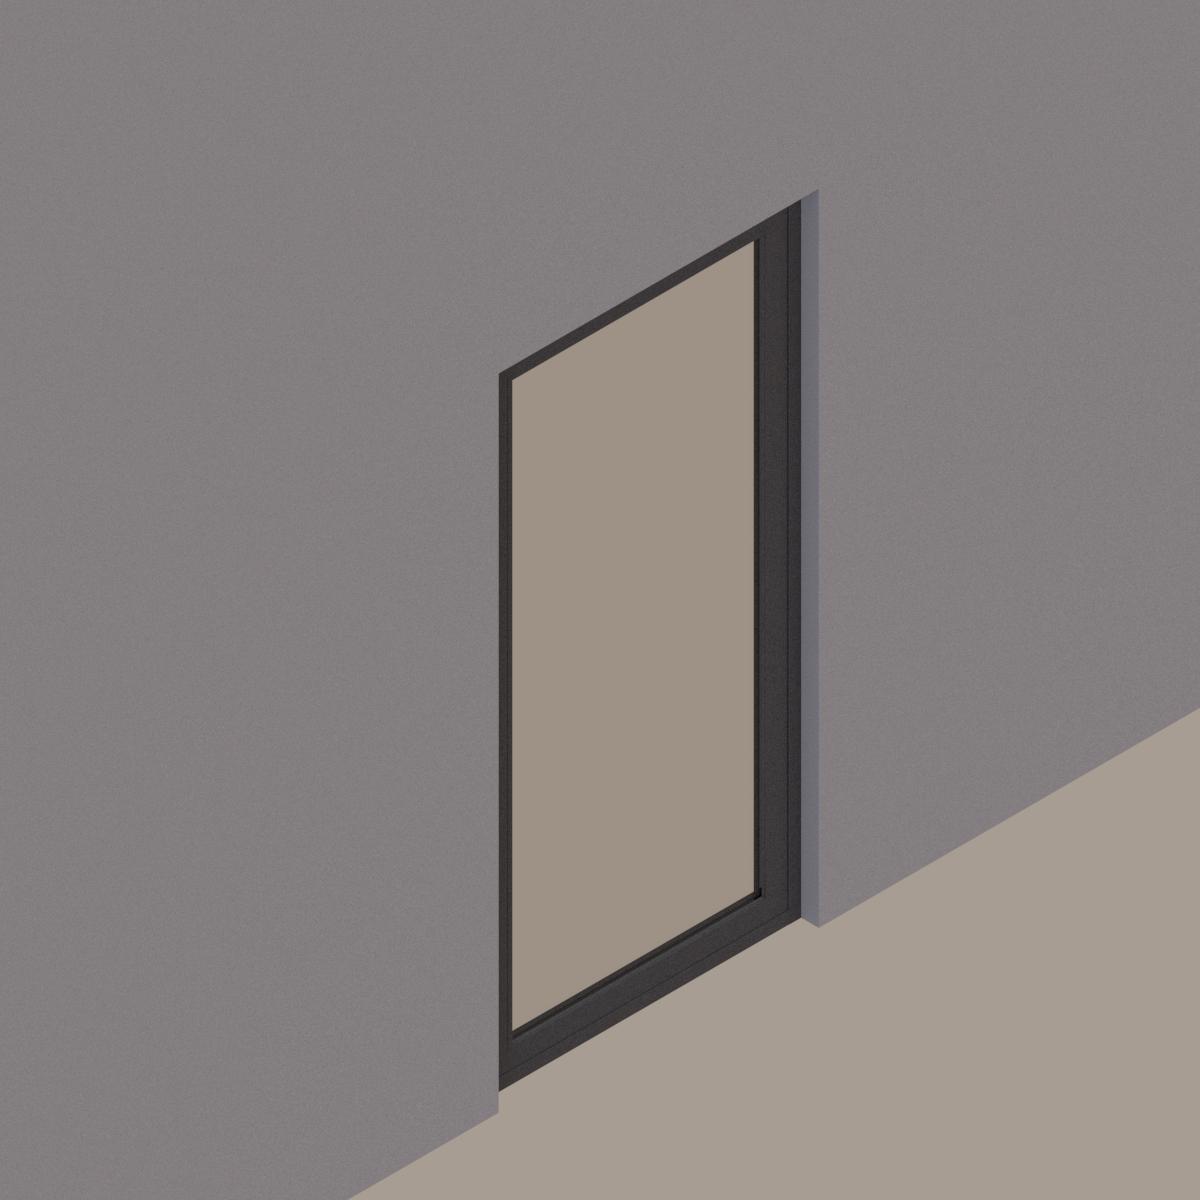 Puerta de abatir 1 hoja cristal termopanel bf9631b9 c516 4511 a0b3 69c32ae3daca